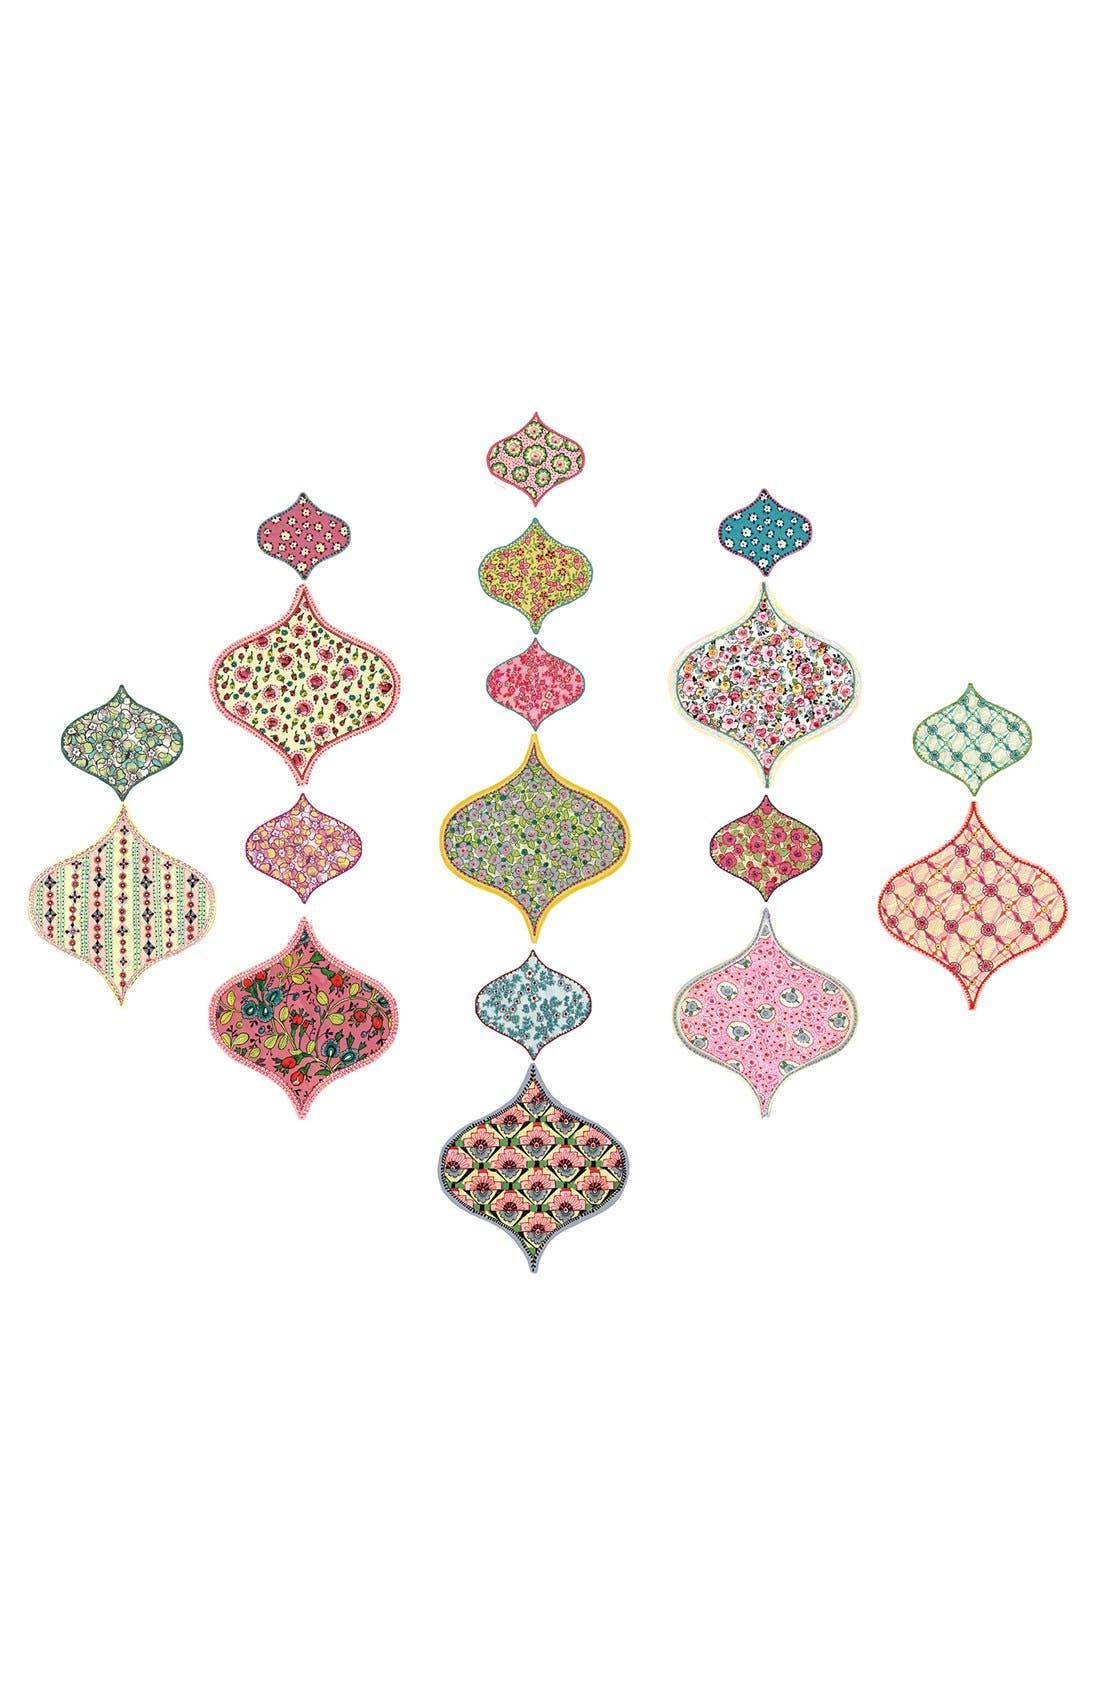 Alternate Image 1 Selected - Wallpops 'Boho Chic' Wall Art Decal Kit (Set of 18)